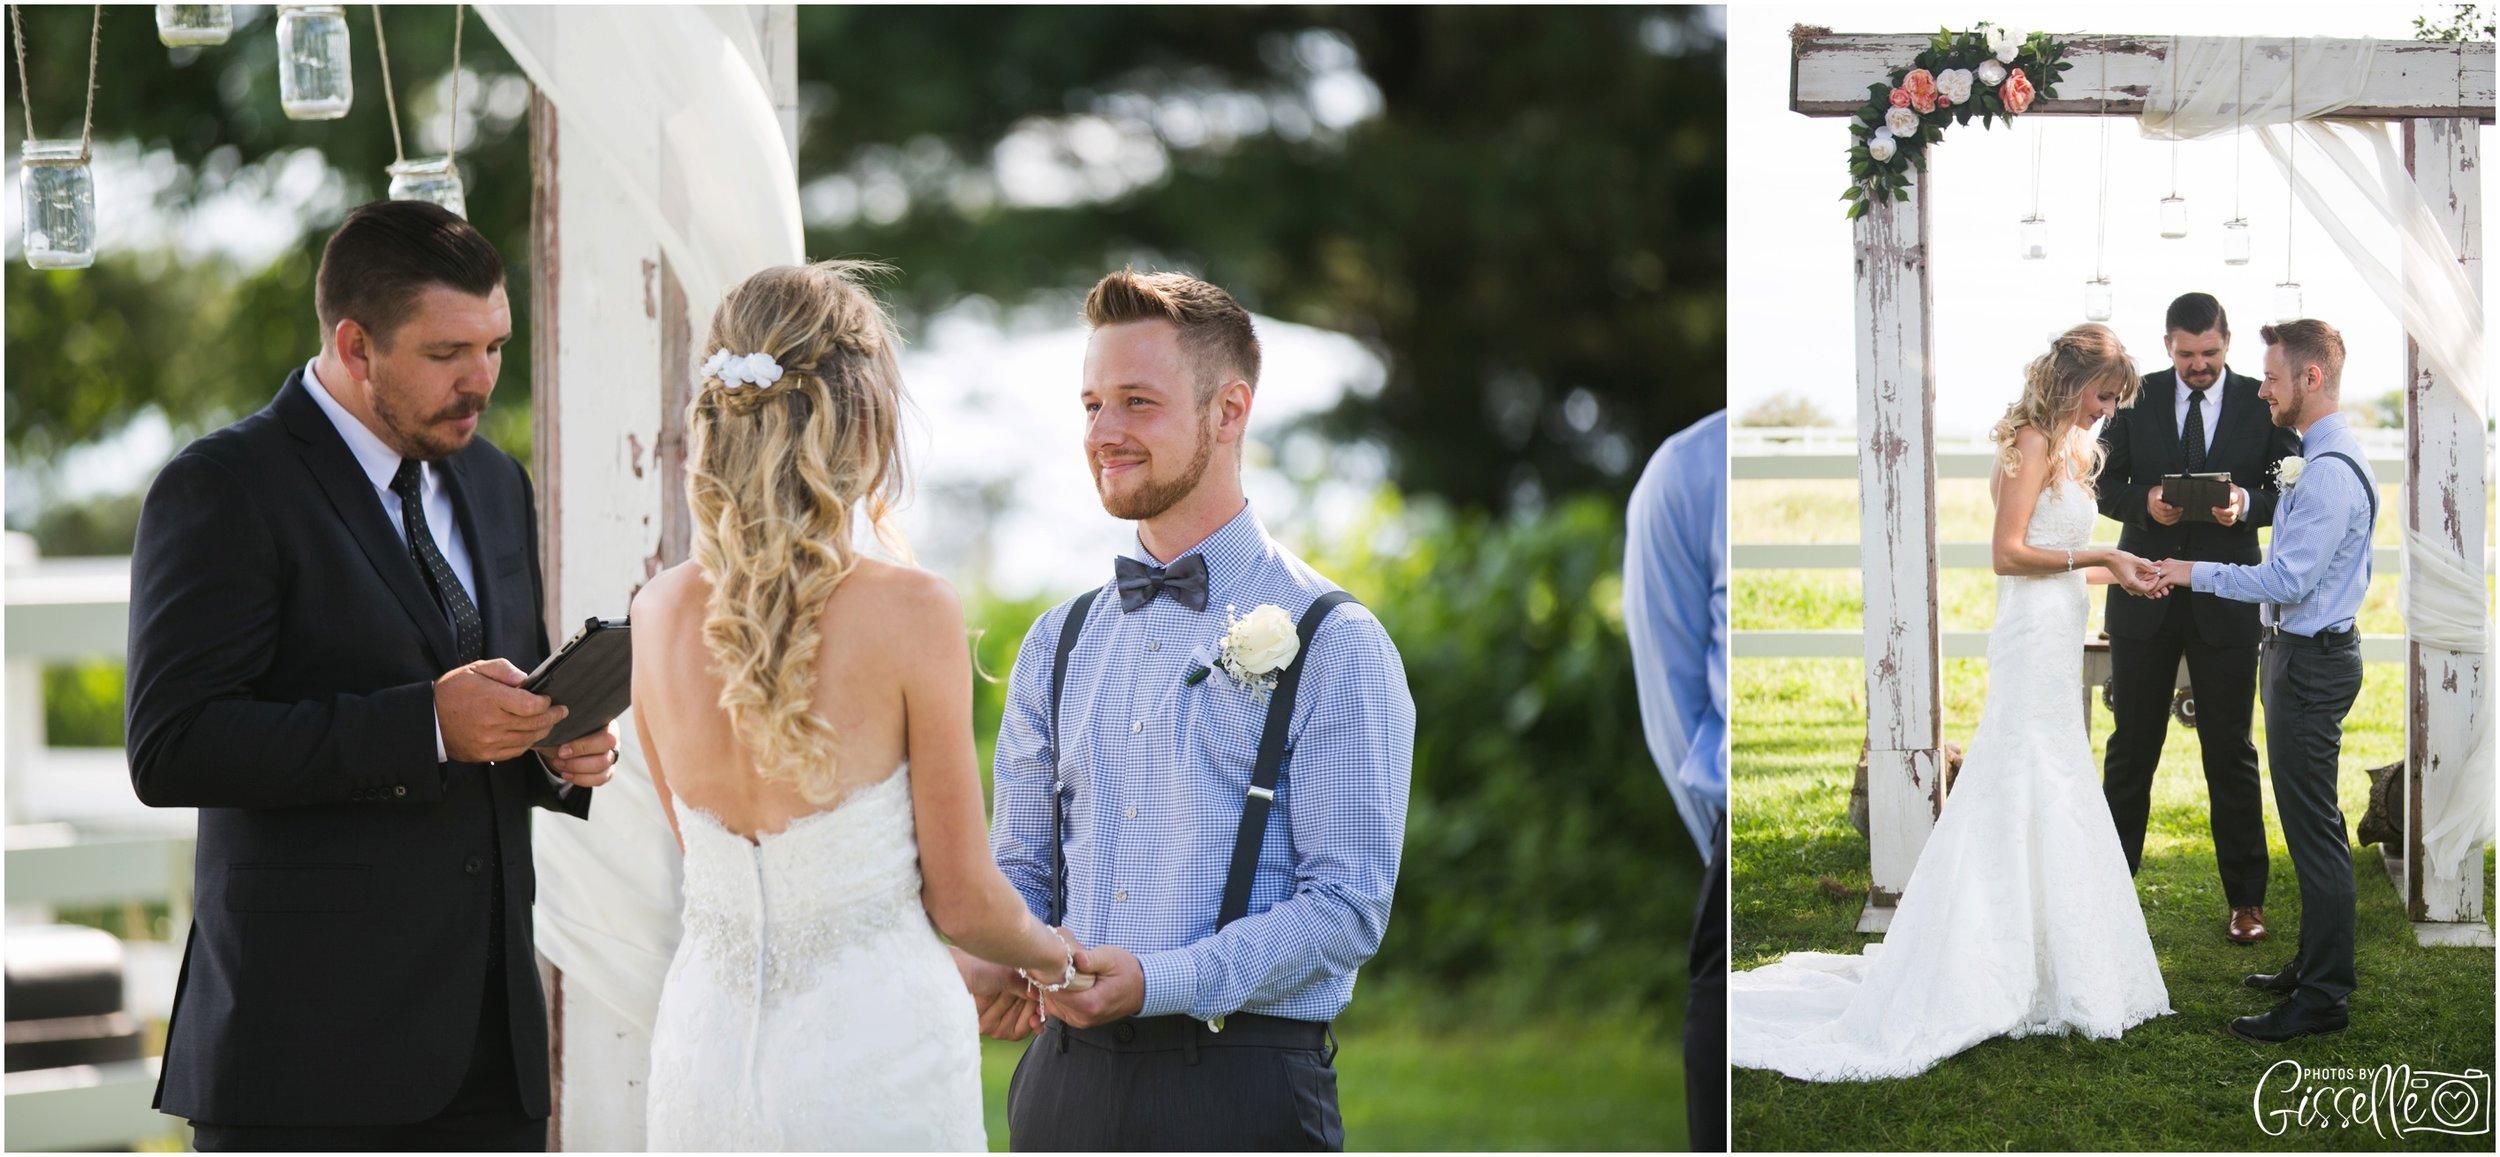 Northfork Farm Wedding_0394.jpg